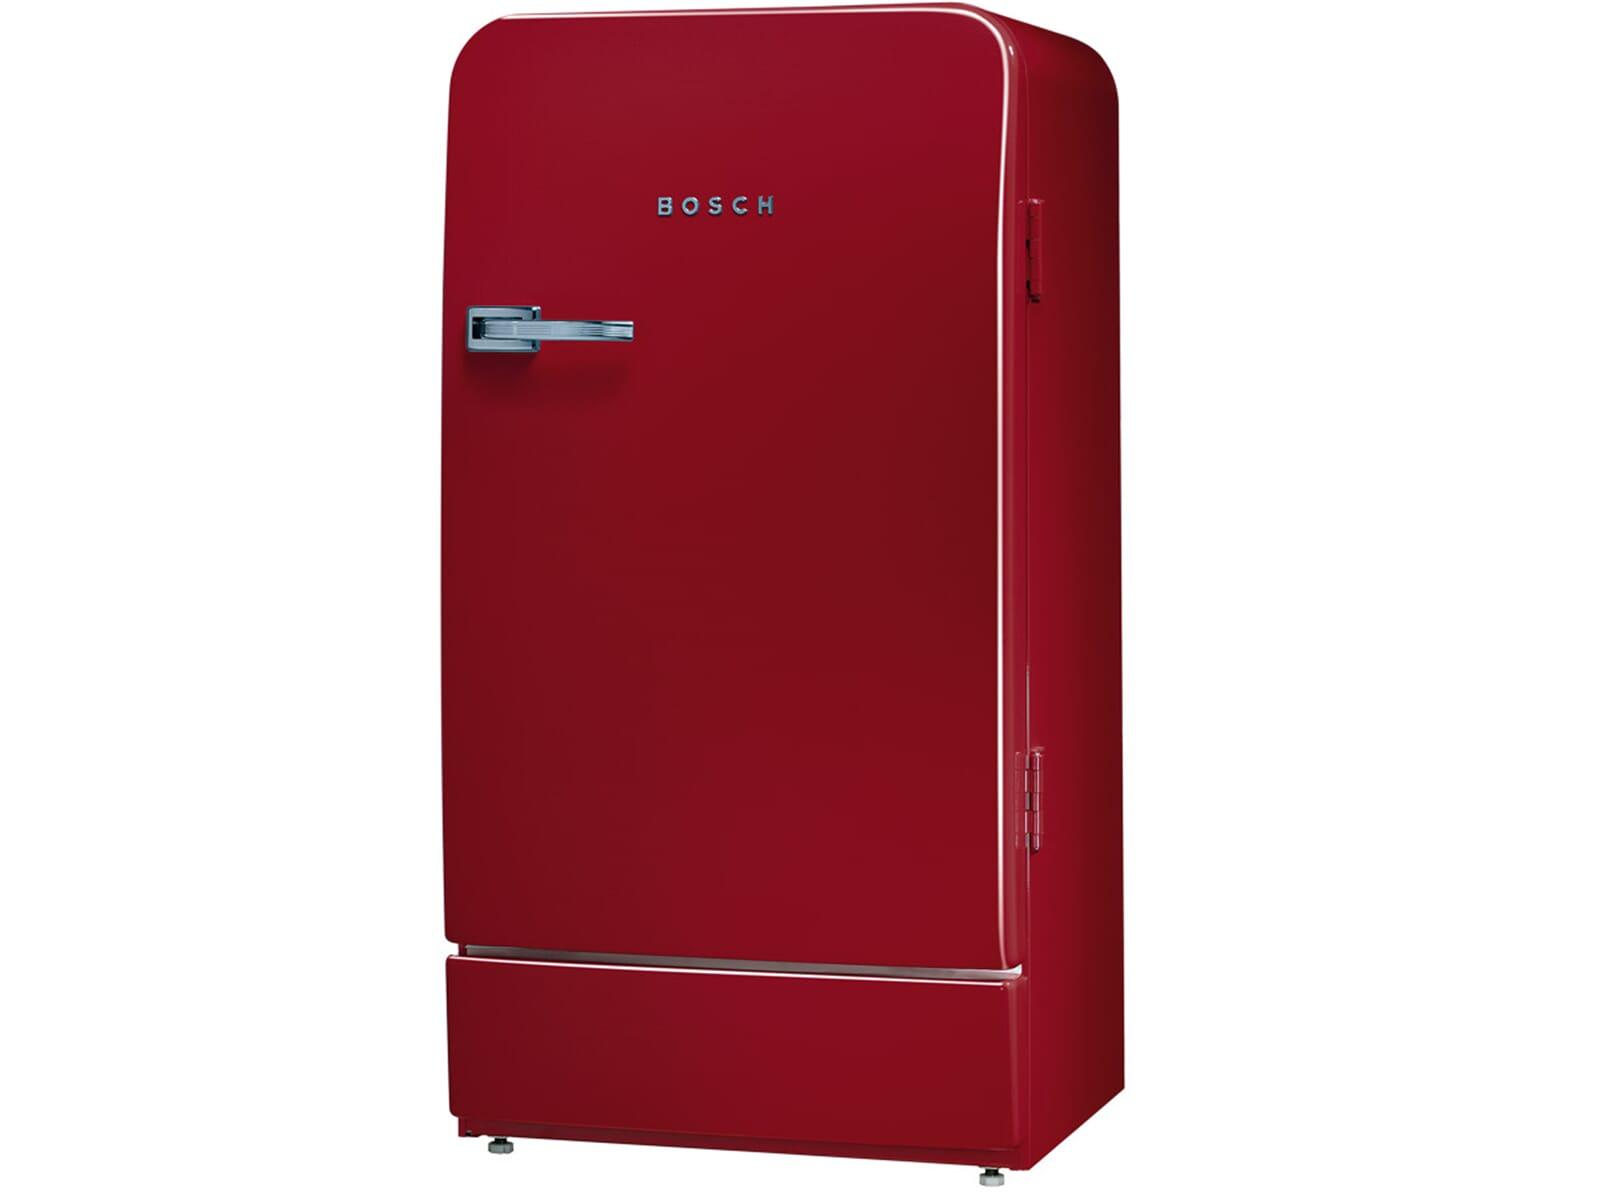 Bosch Kühlschrank Handbuch : Ignis kühlschrank thermostat wechseln anleitung kühlschrank kühlt